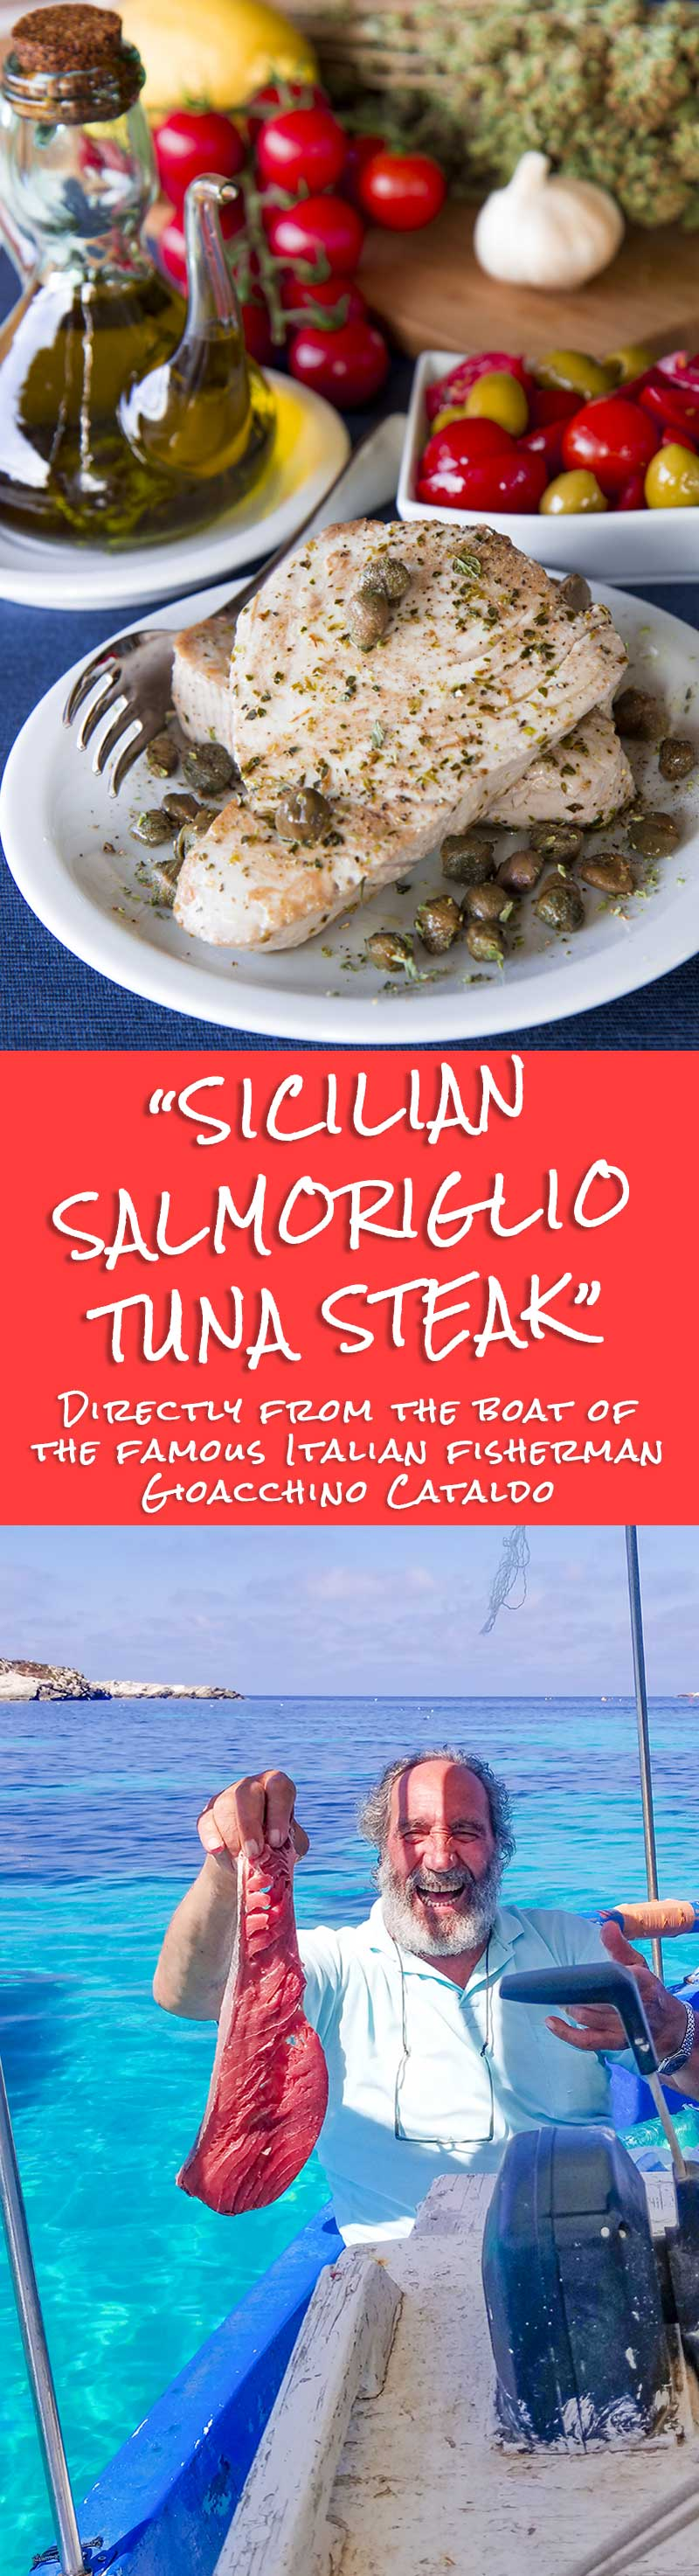 SALMORIGLIO TUNA STEAK RECIPE ON THE BOAT: eating with a Sicilian fisherman!